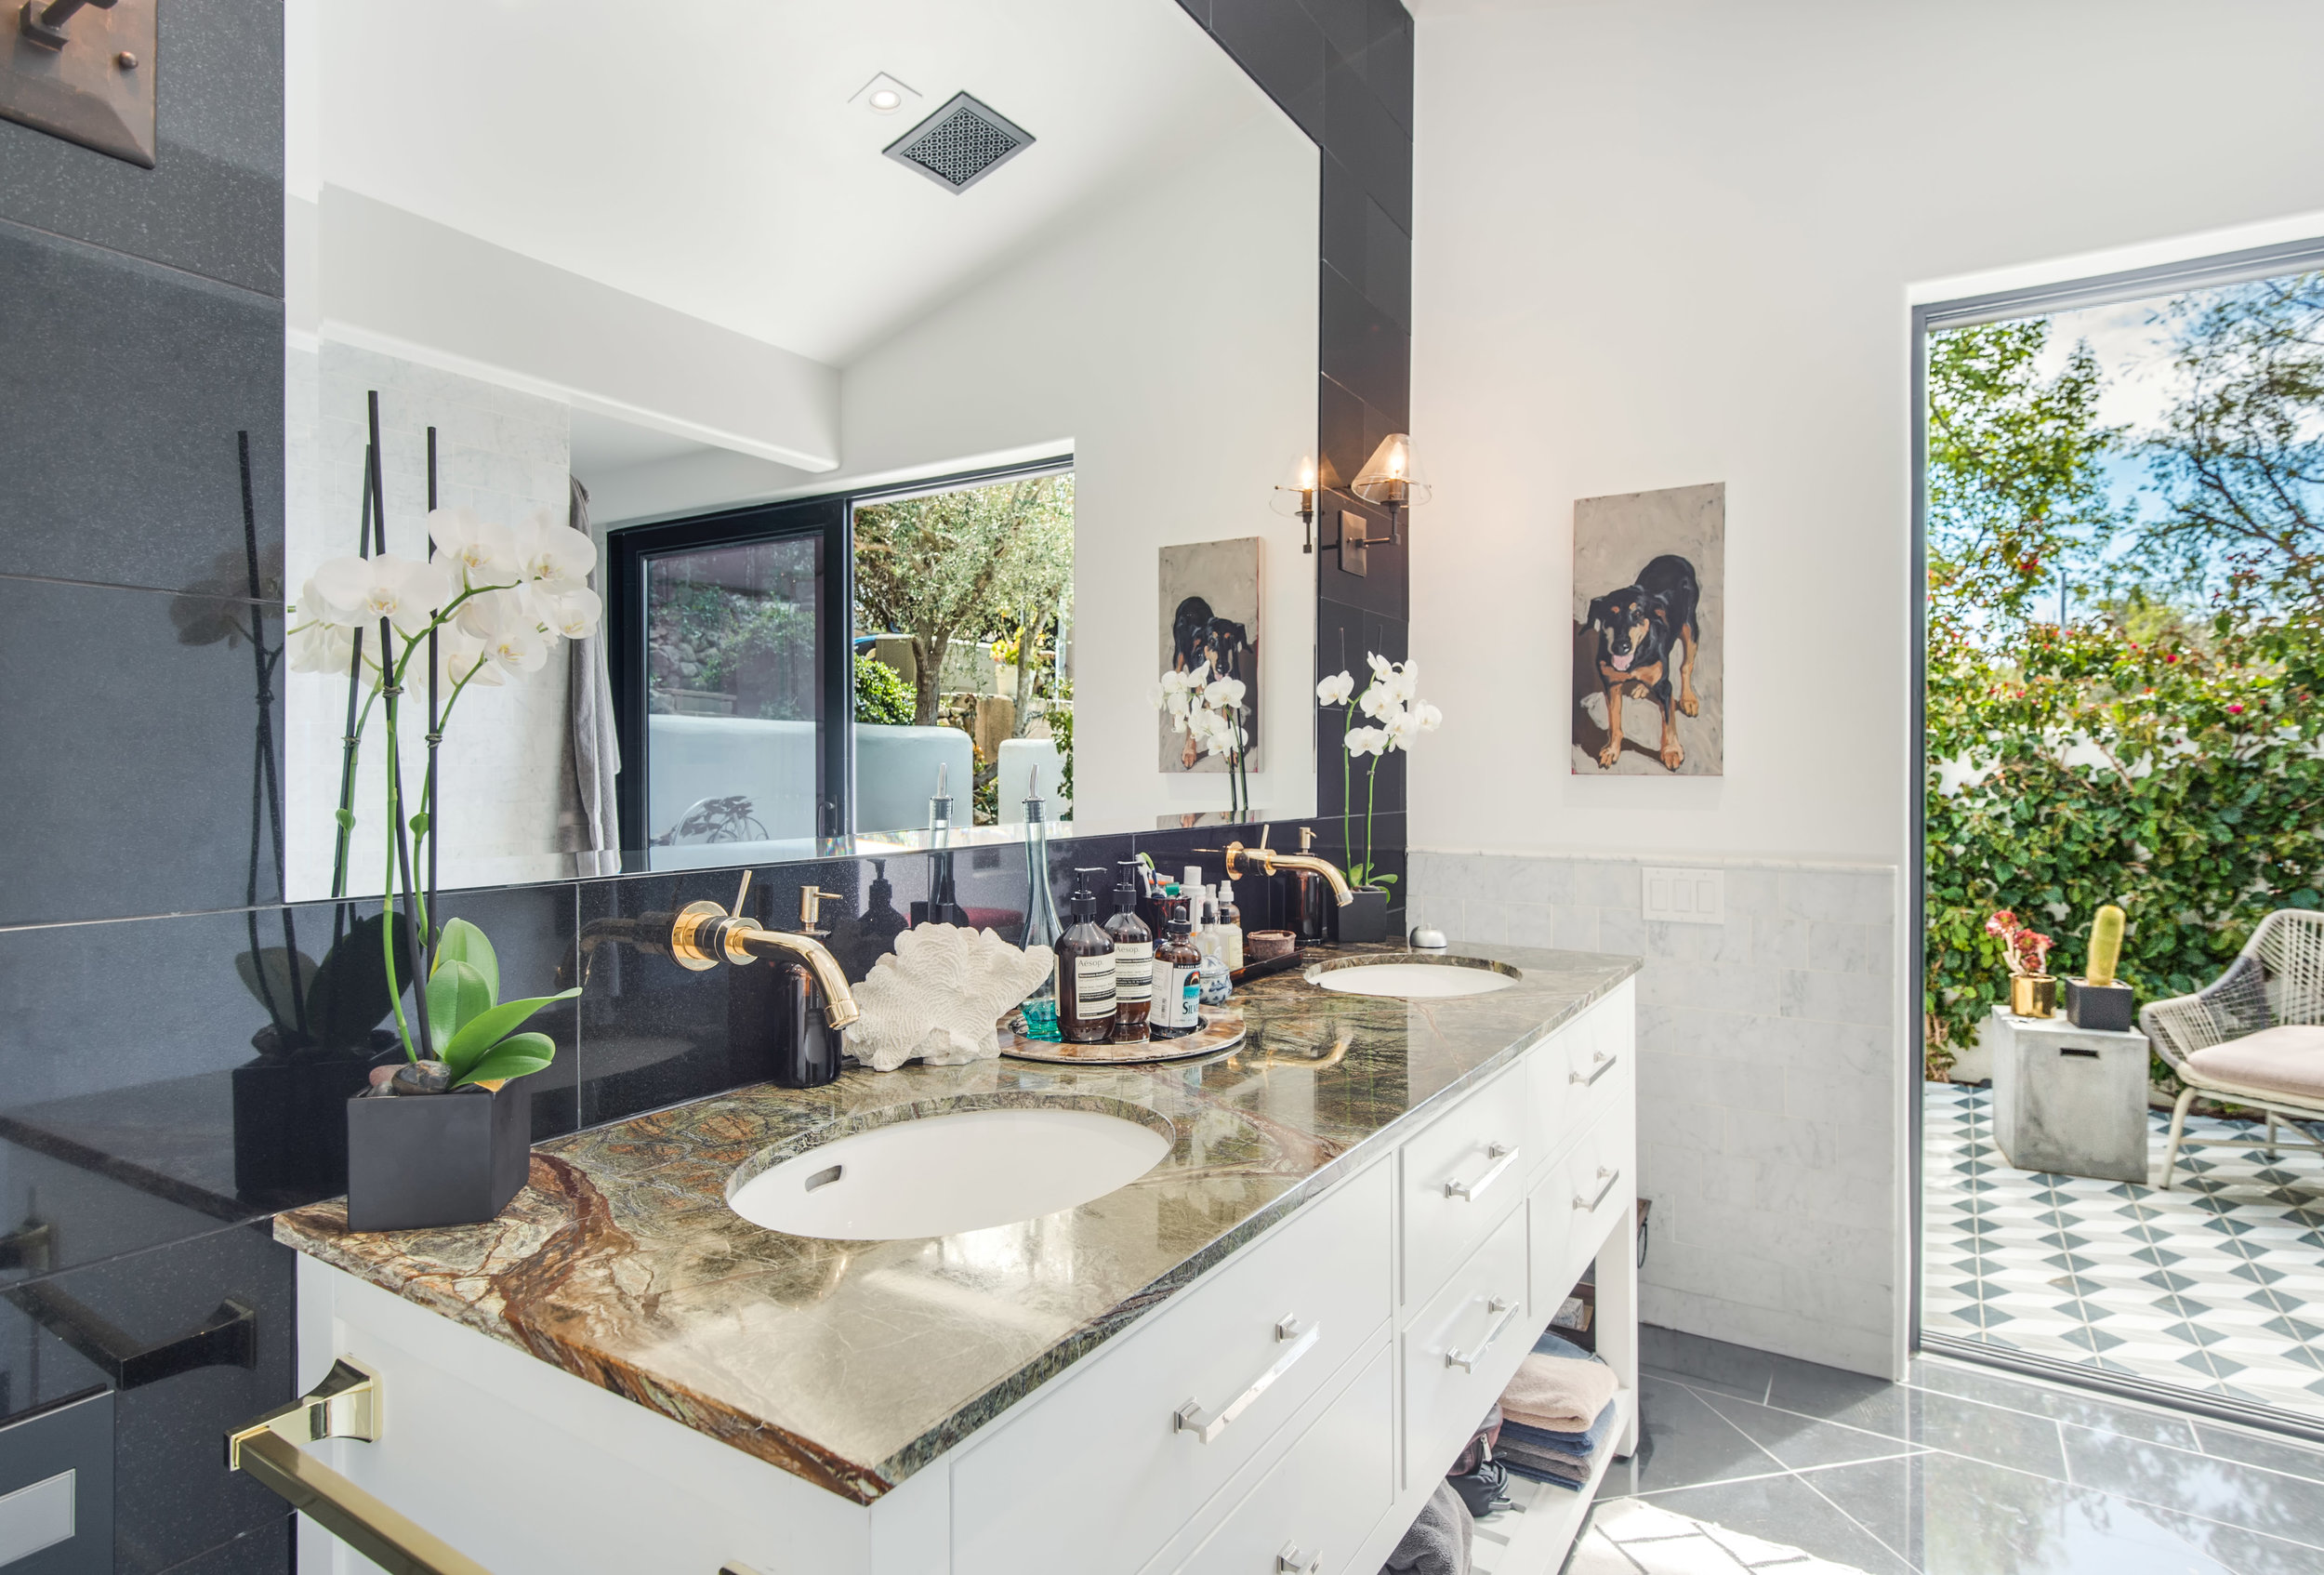 020 Bathroom 26272 Cool Glen Way Malibu For Sale Luxury Real Estate.jpg